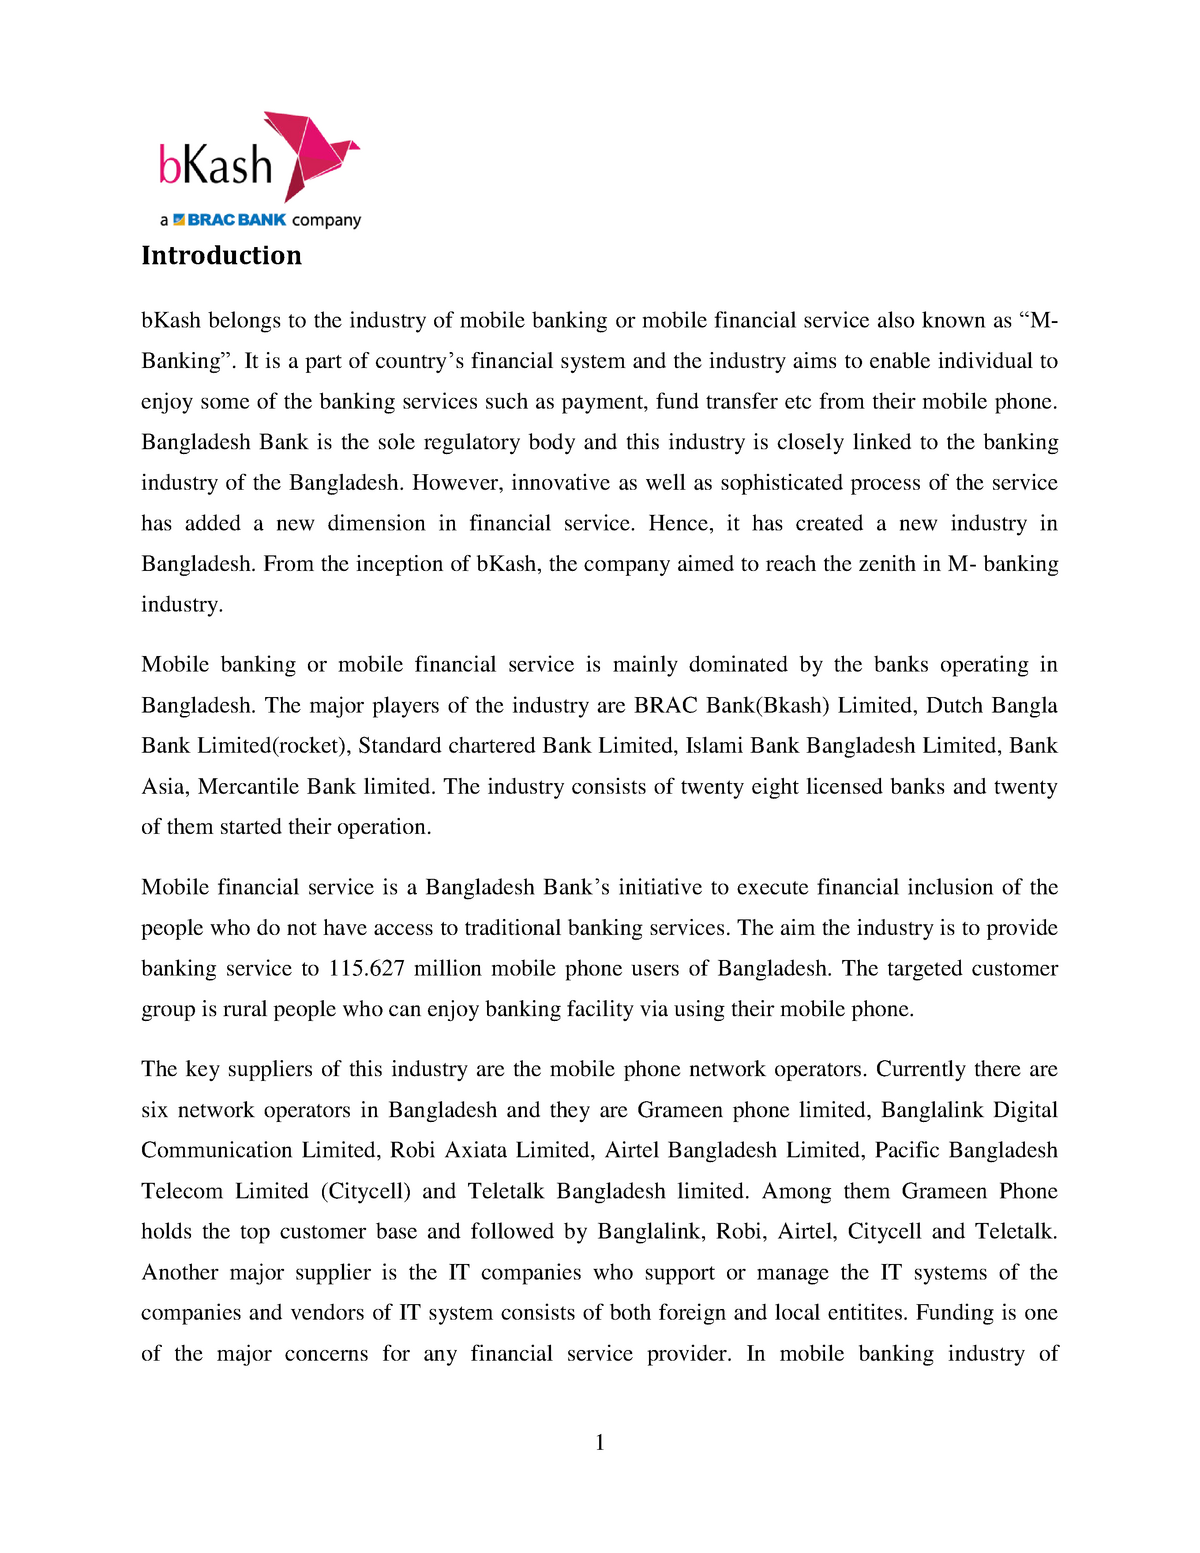 Marketing Strategy of b Kash - FB-502: Fundamental of Marketing